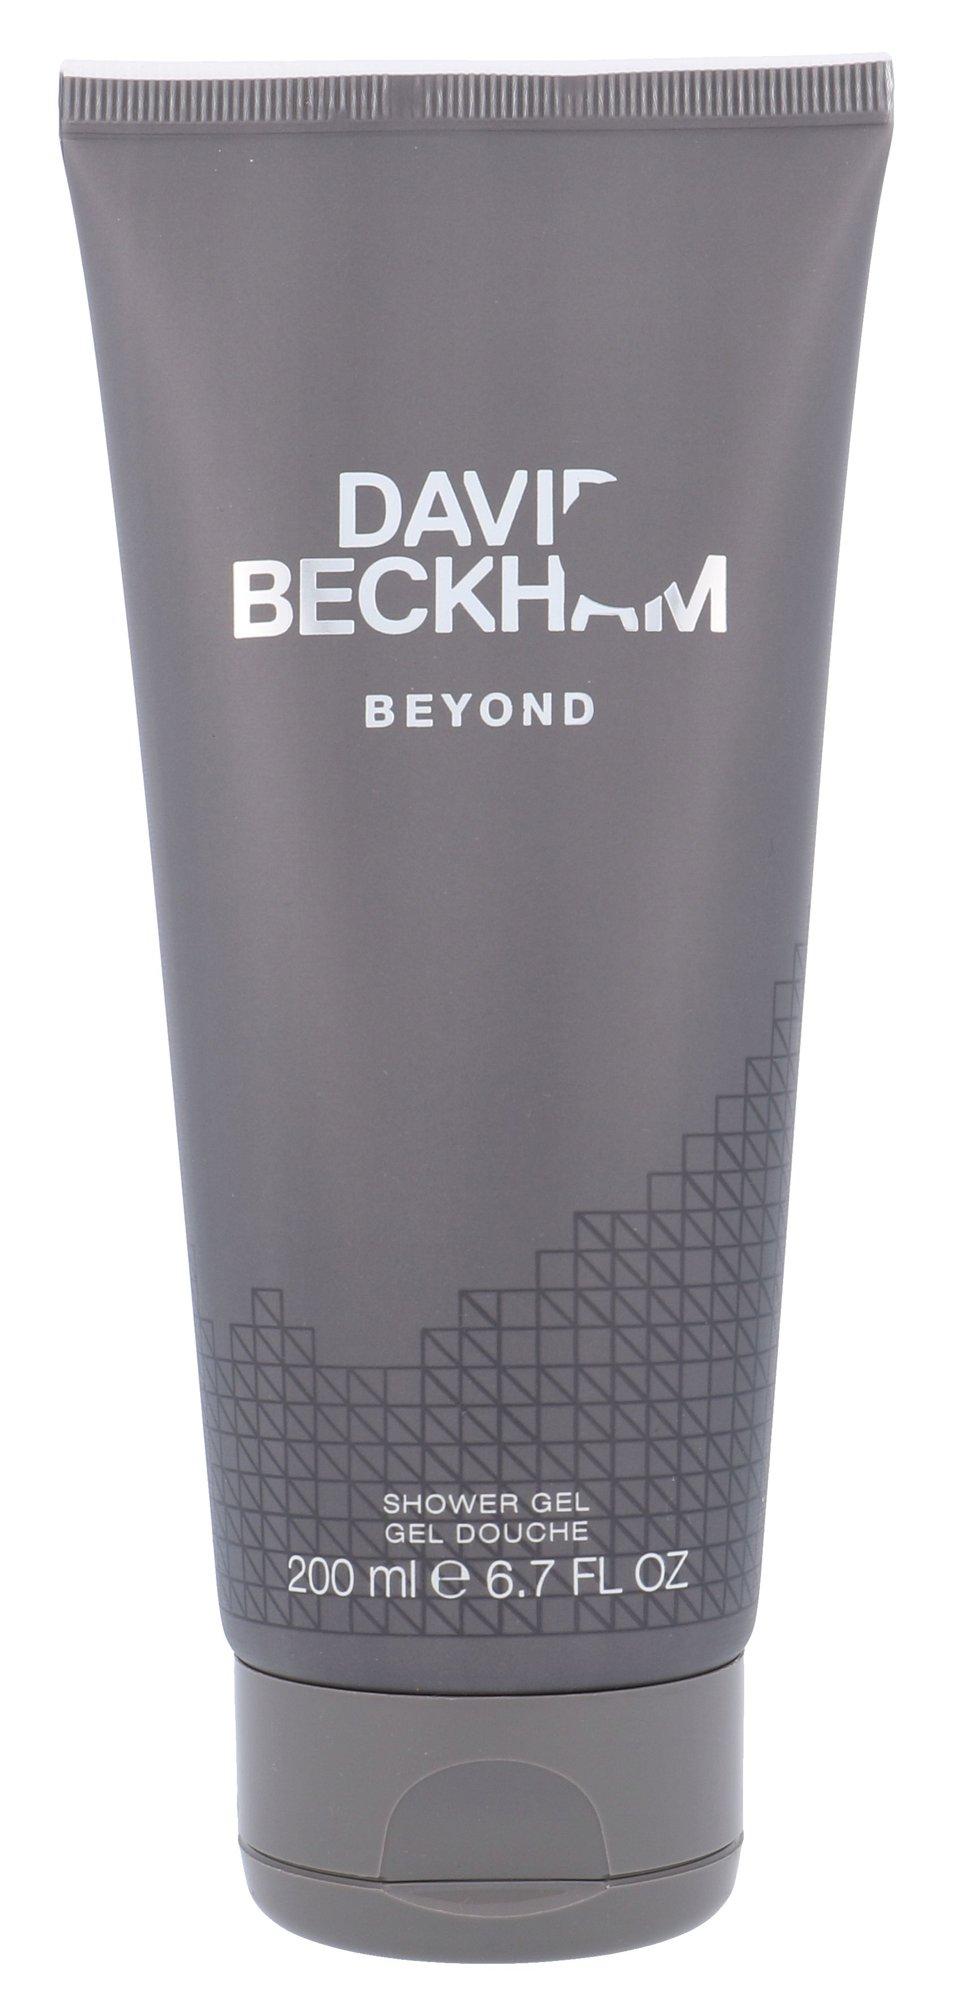 Dušo gelis David Beckham Beyond